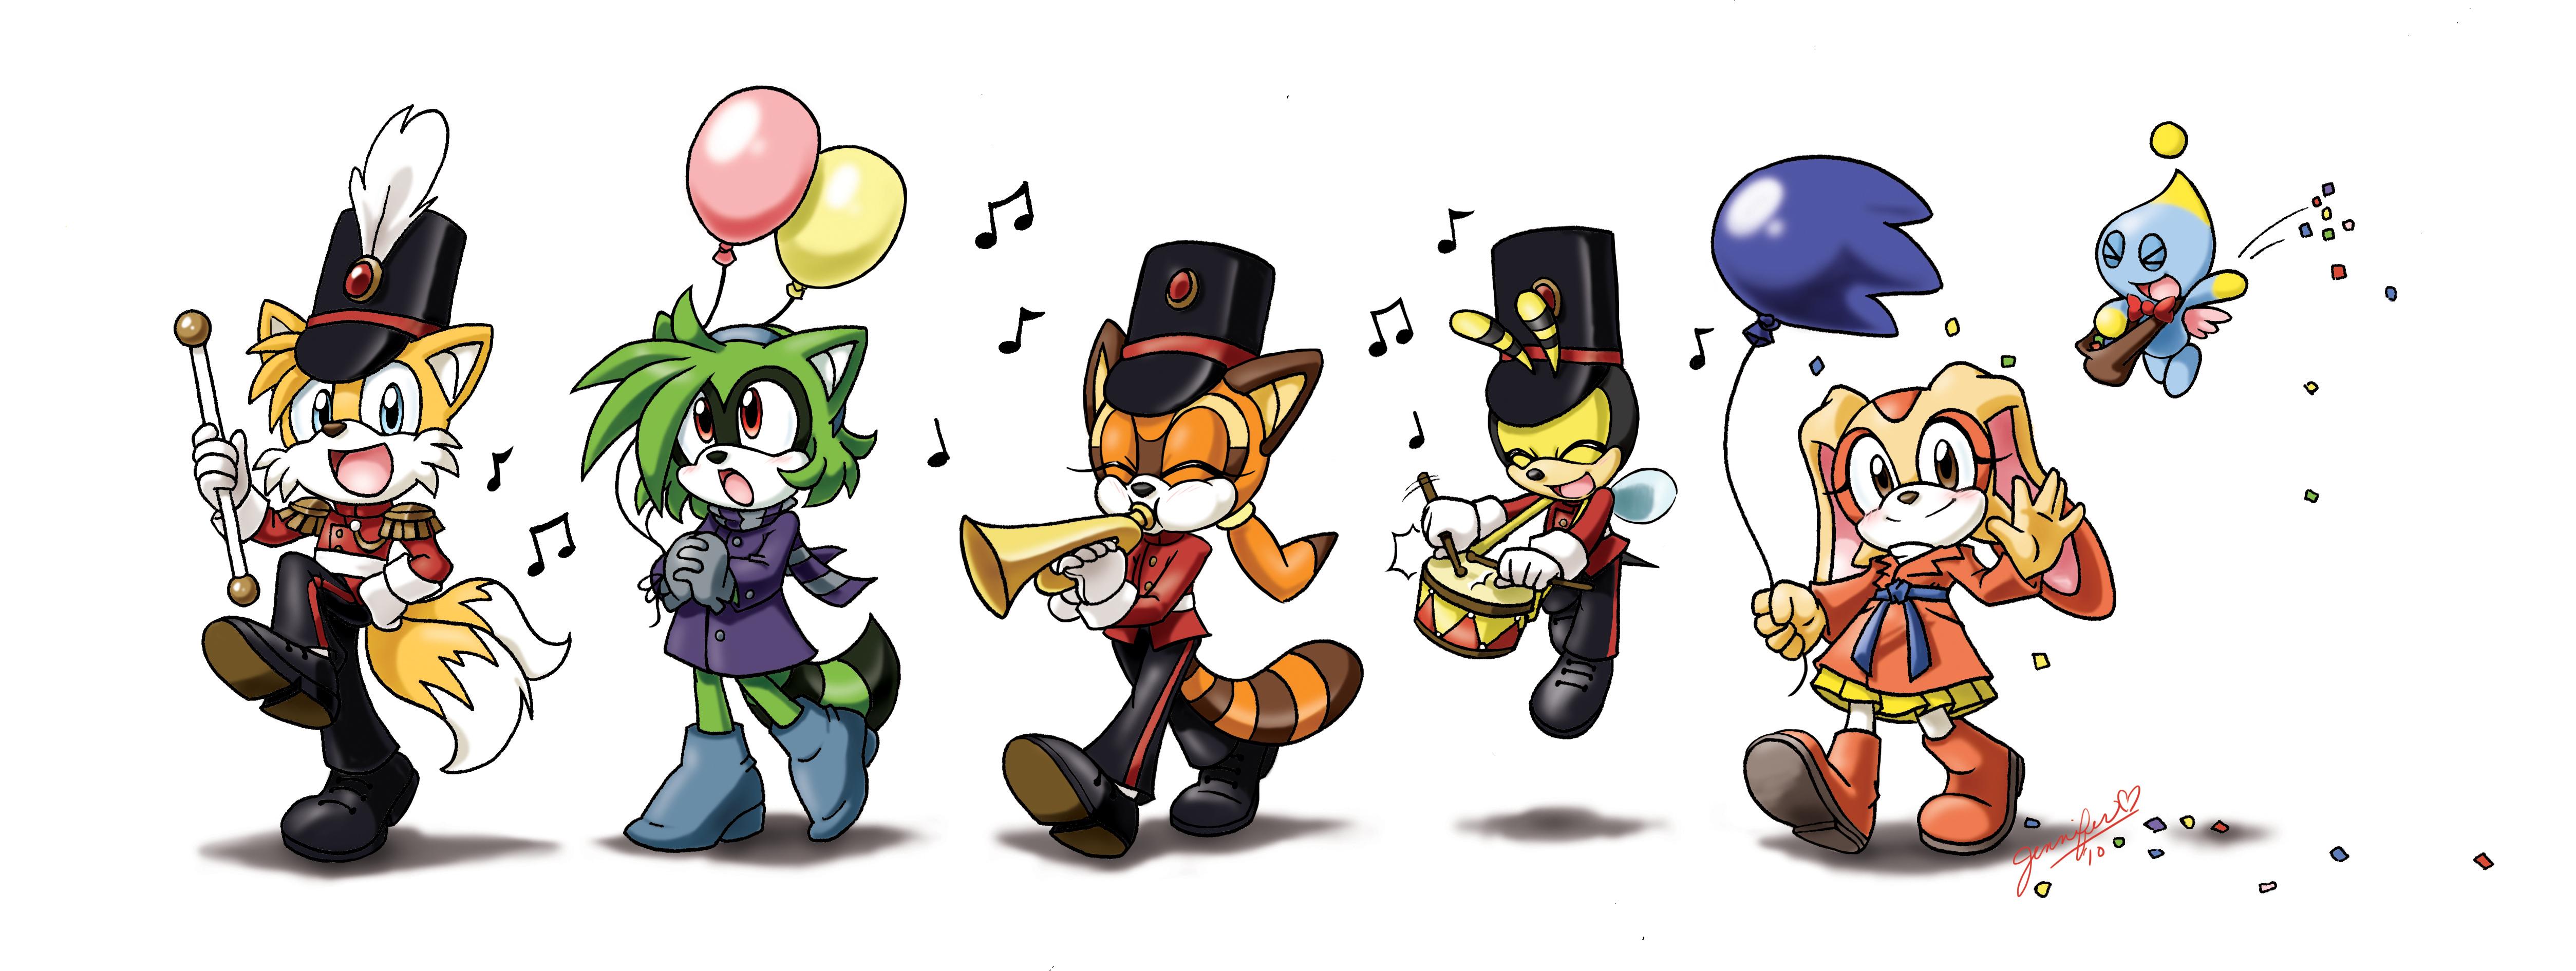 Sonic The Hedgehog Full